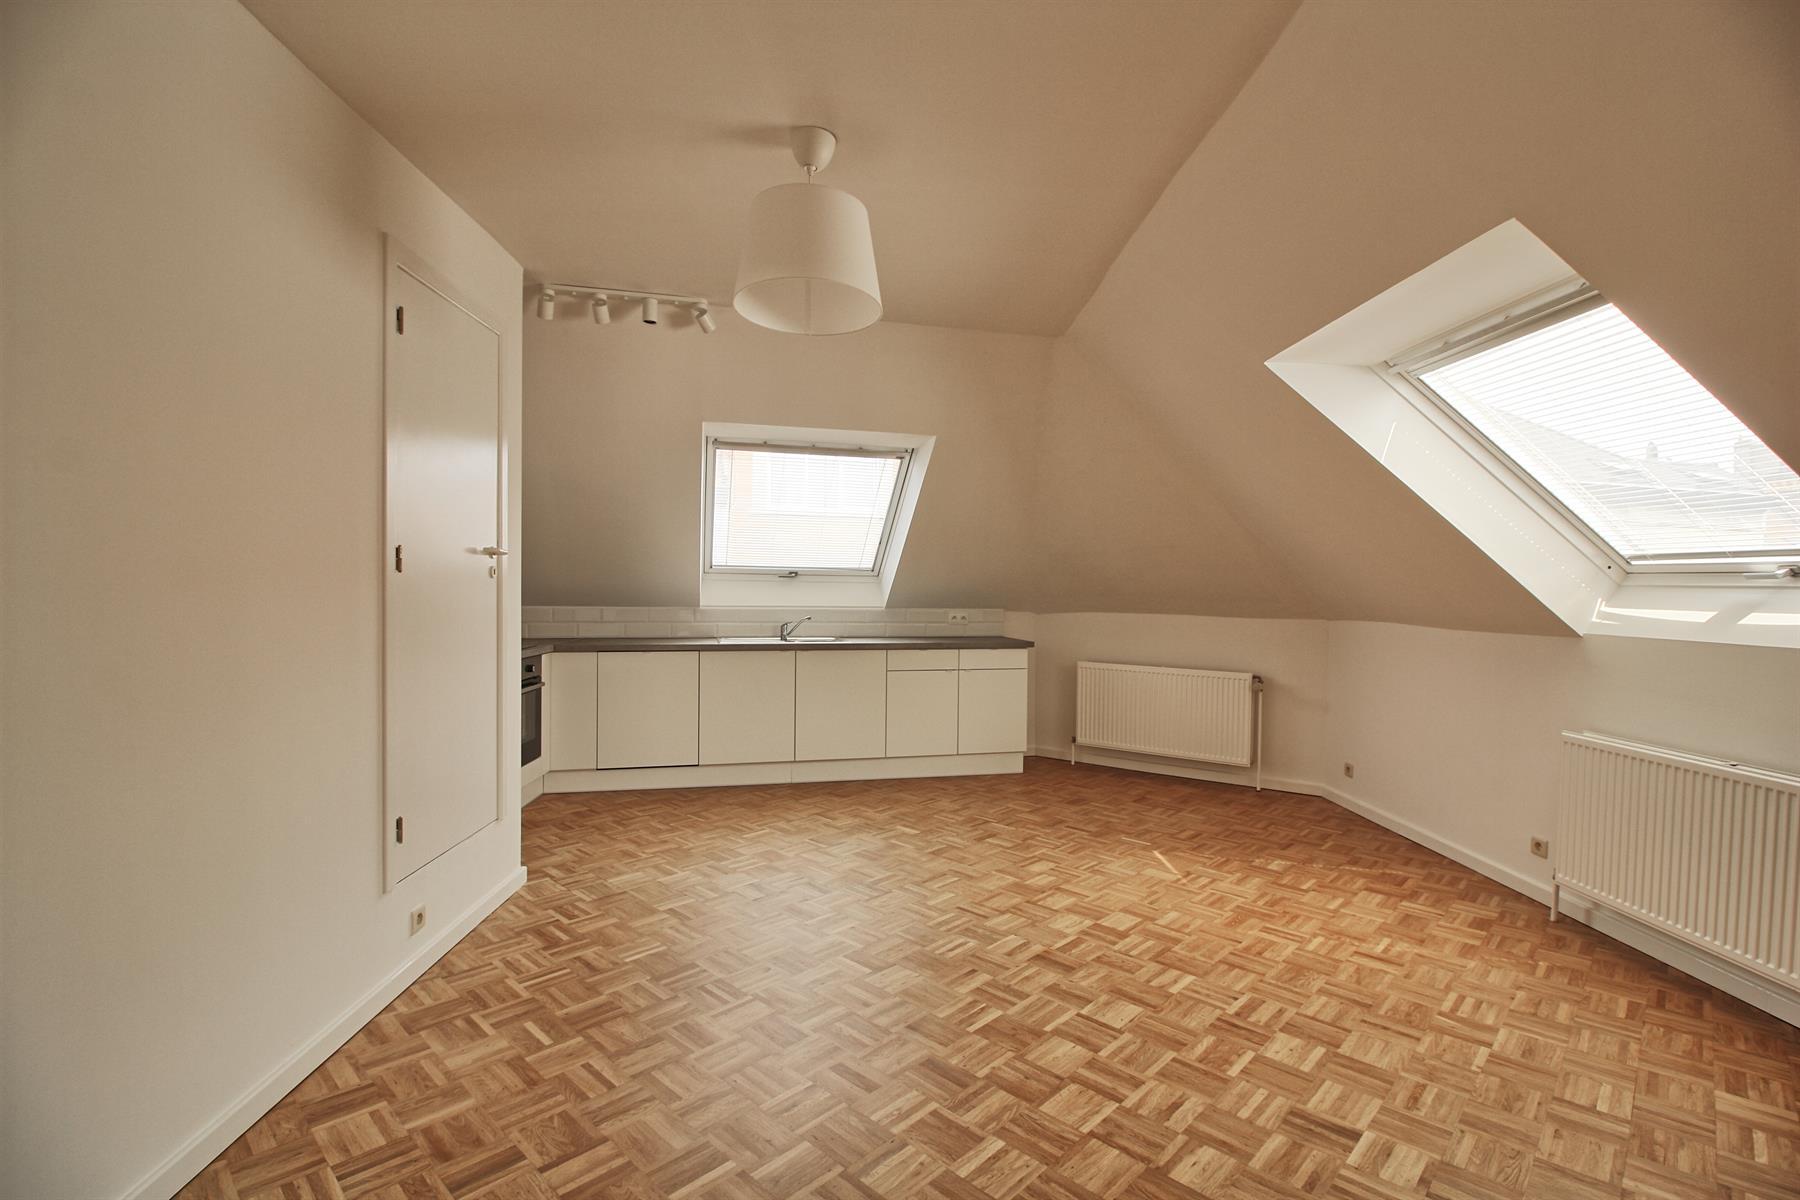 Flat - Etterbeek - #4277250-6